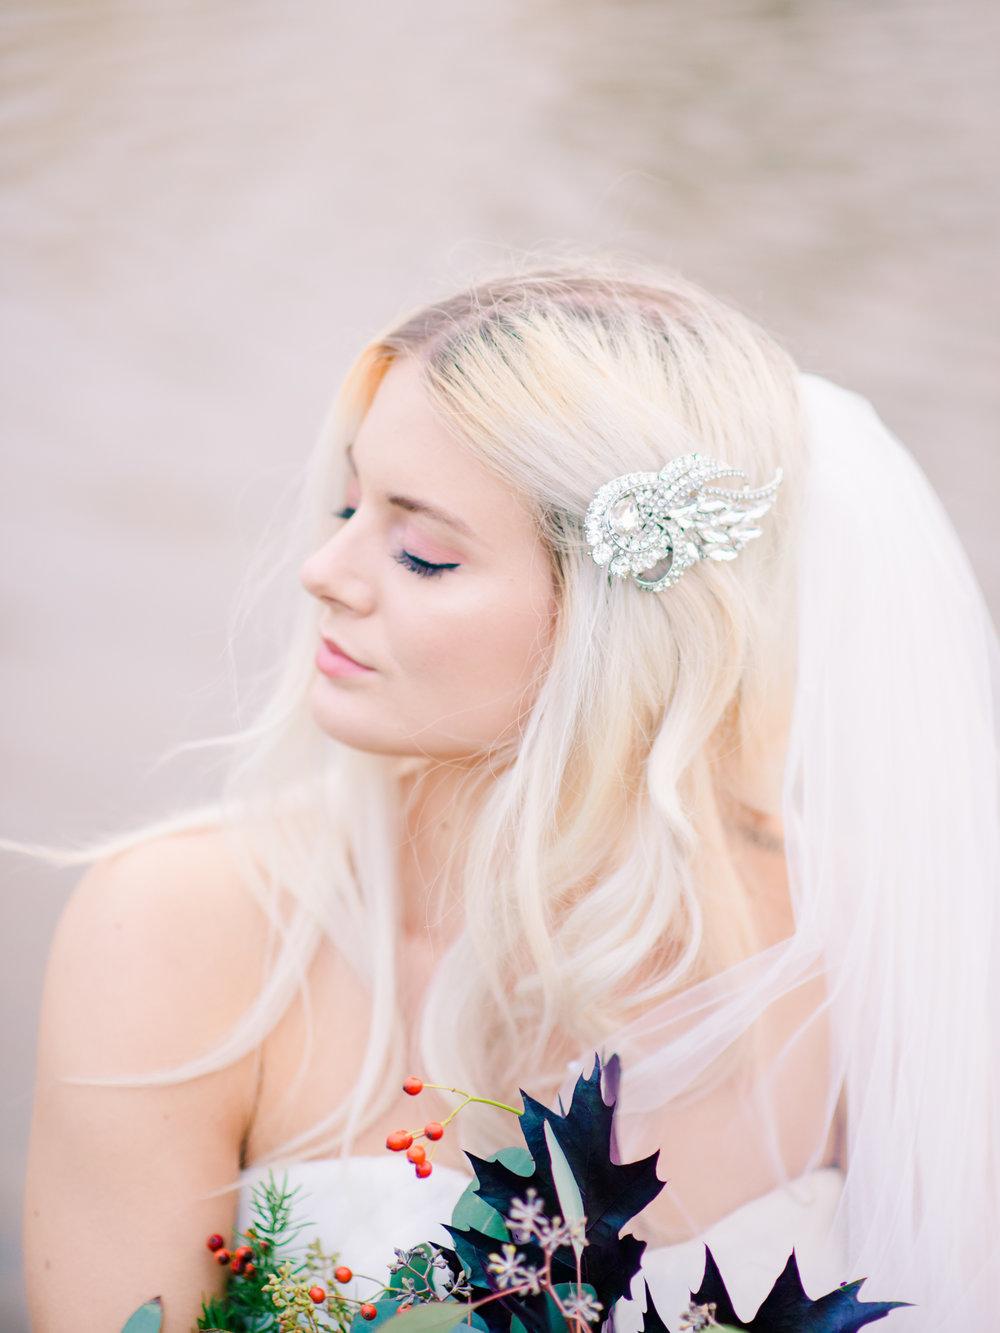 Elegant Organic Fall Swedish Bridal Wedding Styled Shoot - Erika Alvarenga Photography-34.jpg